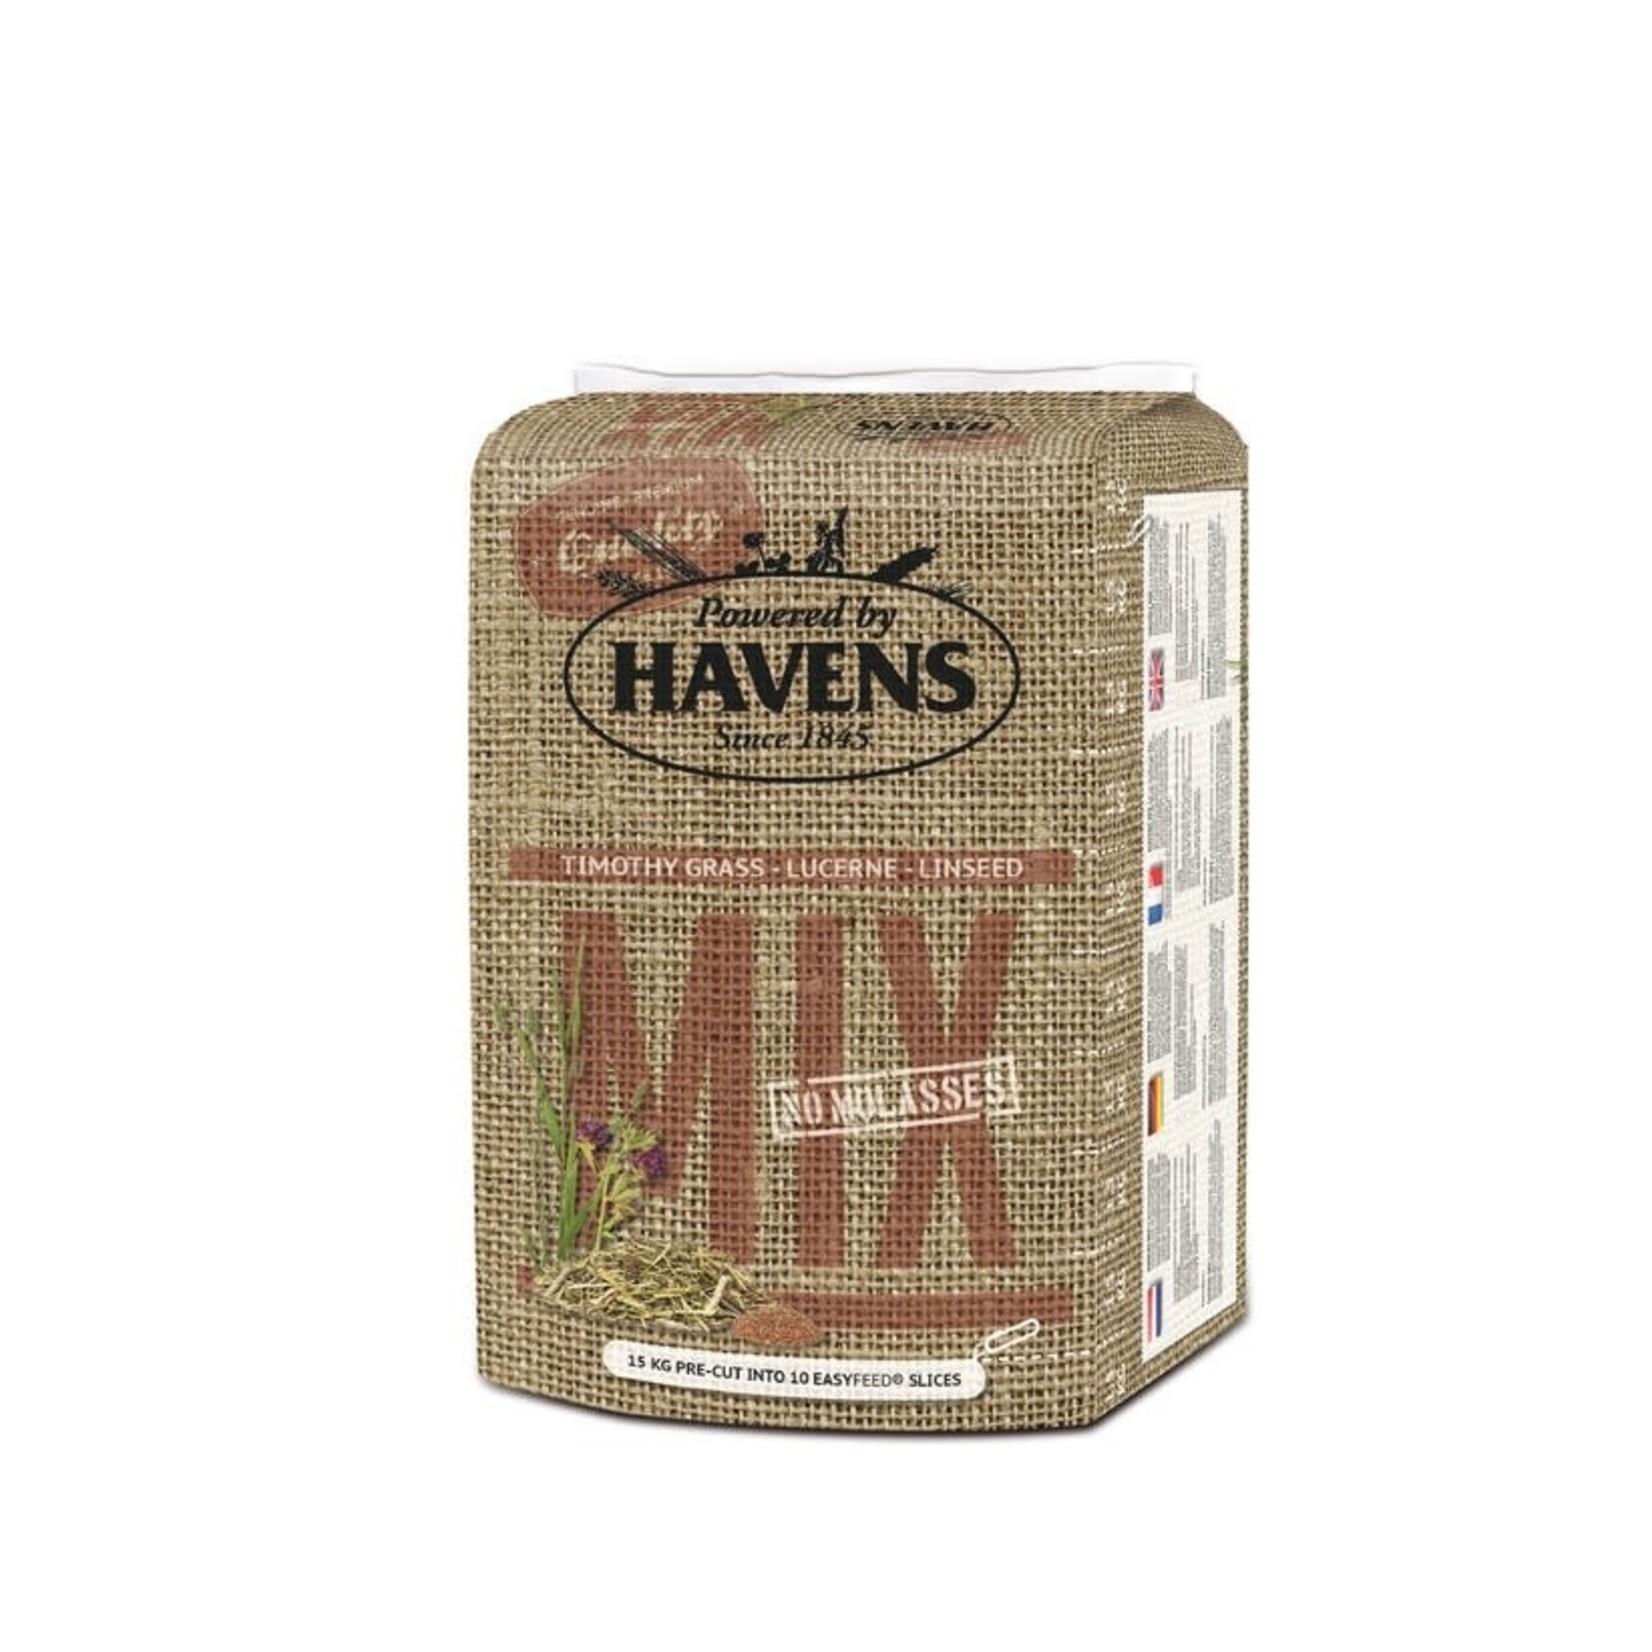 Havens Havens Mix